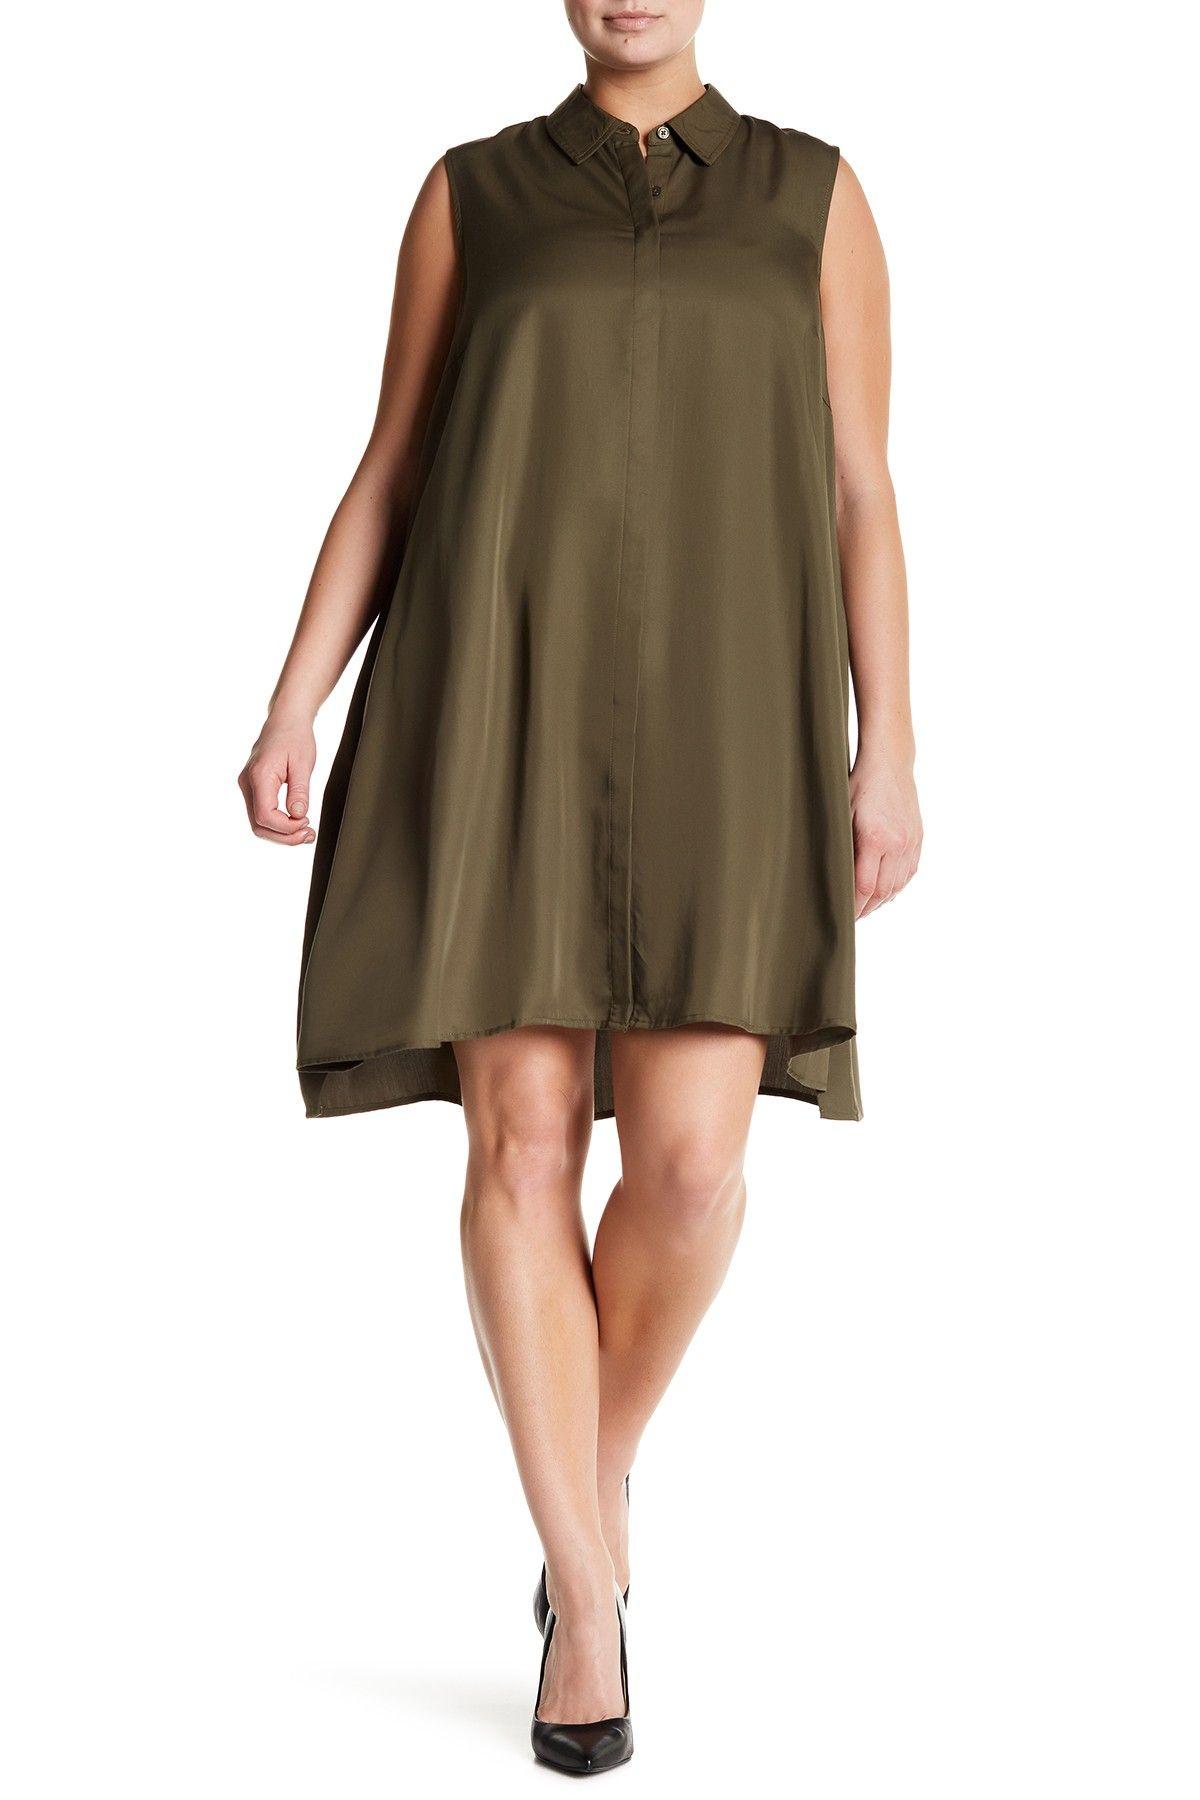 Sharagano Sleeveless Shirt Dress Plus Size Shirts Shops And